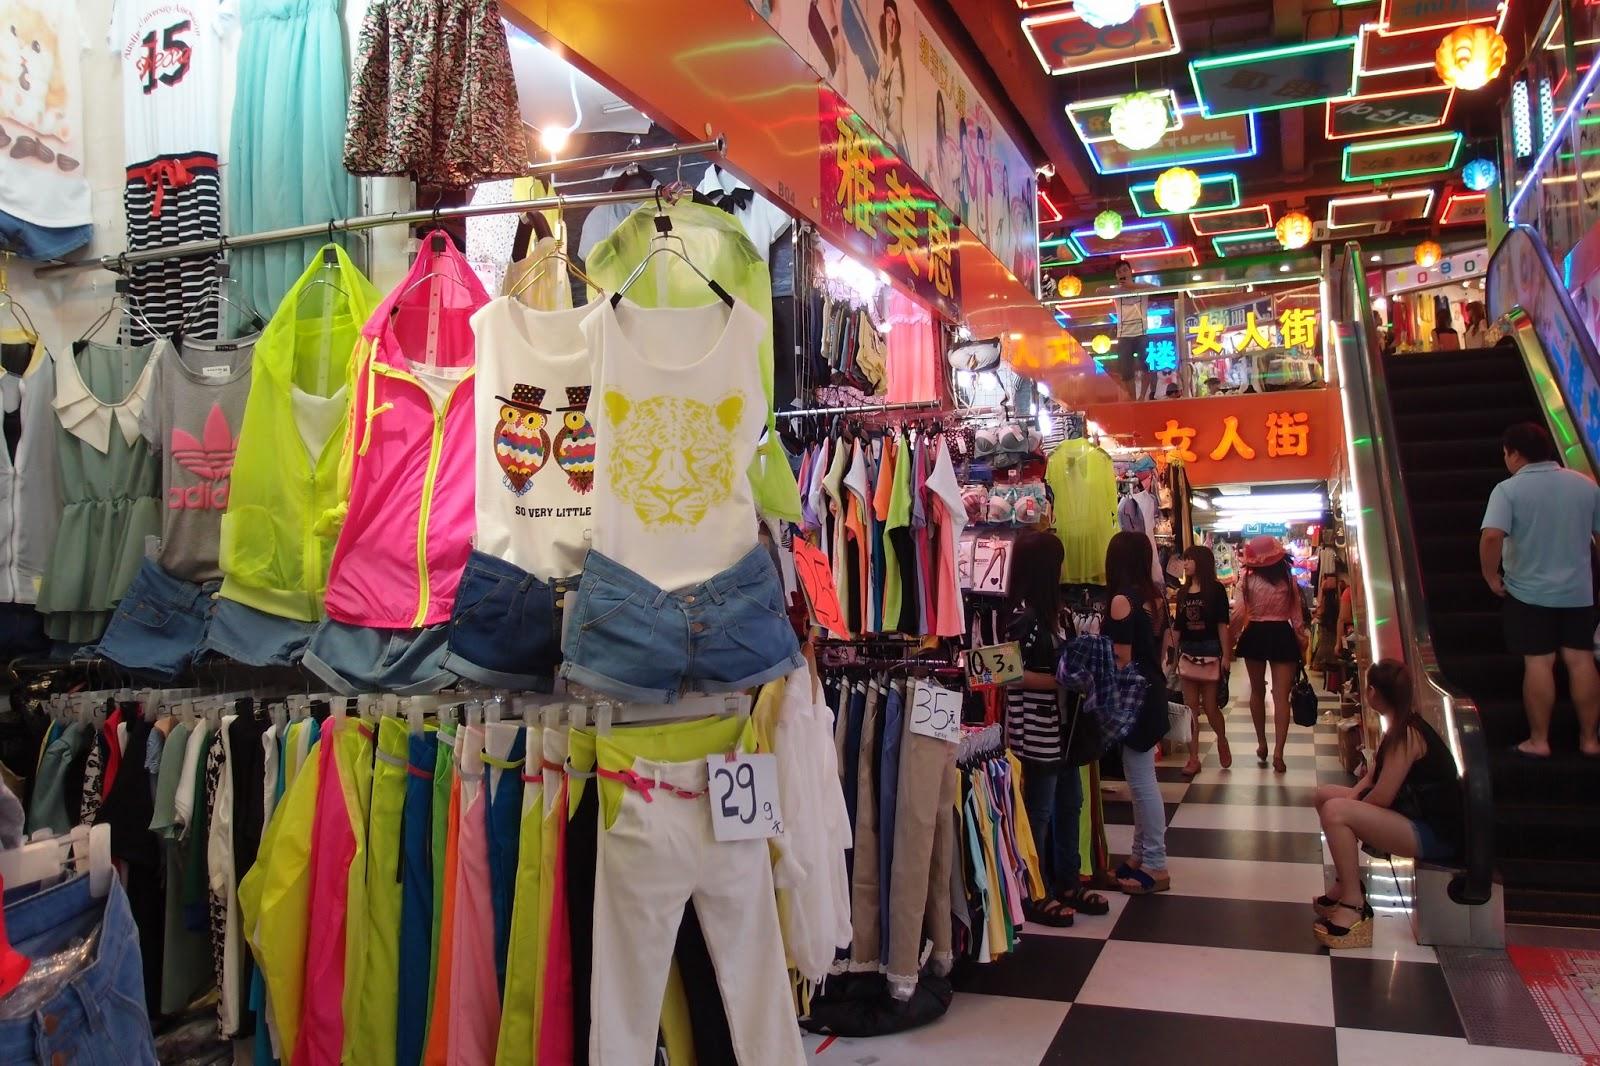 Palimpsest: Shopping in Guangzhou 2013